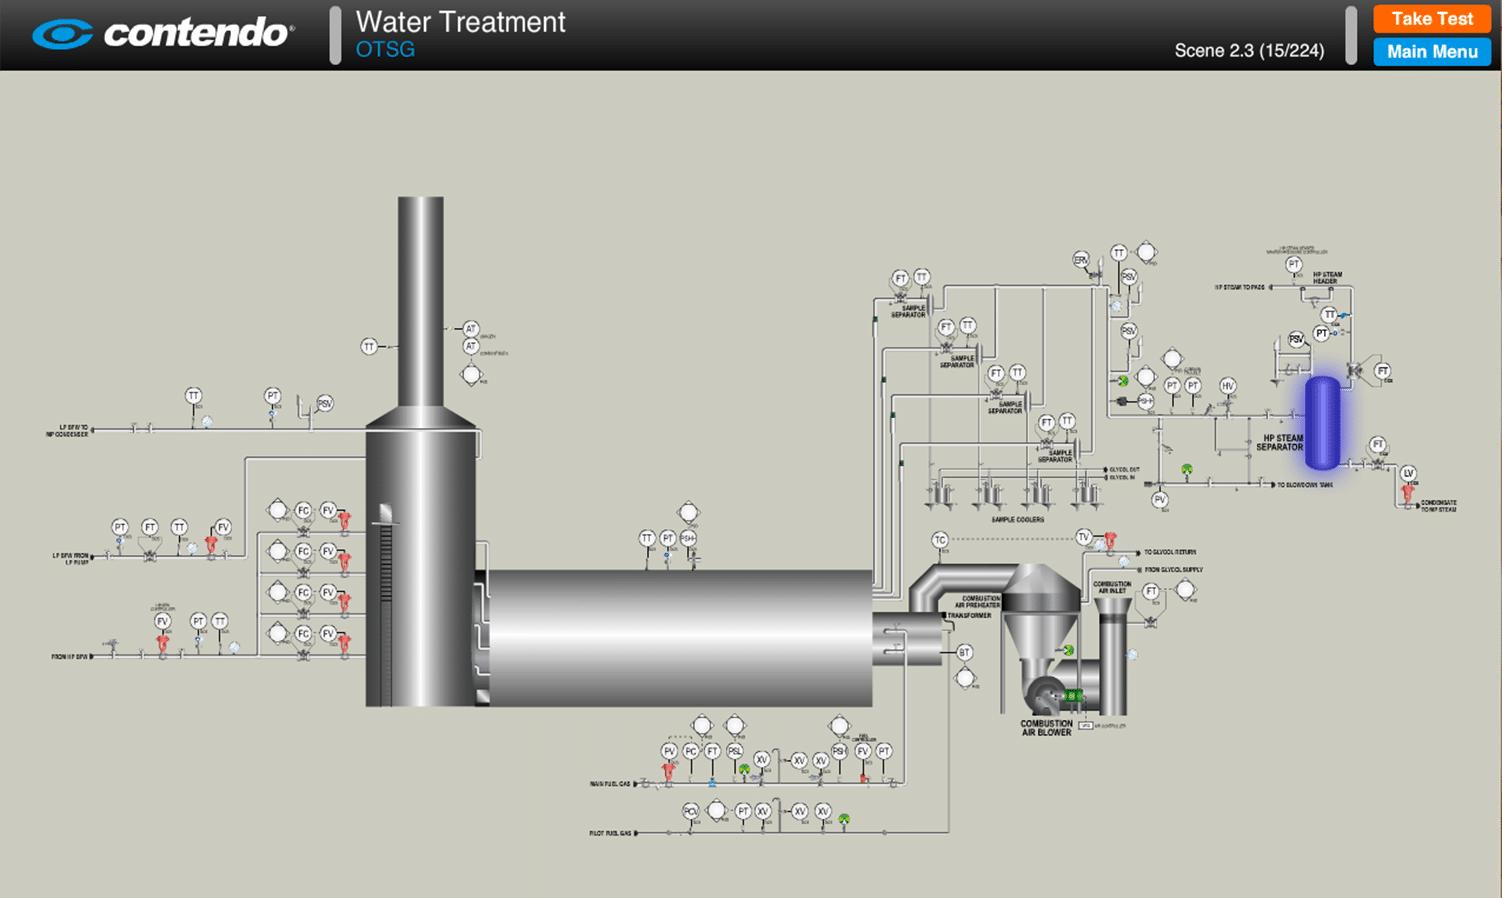 Once Through Steam Generators (OTSG): SAGD Oil Sands